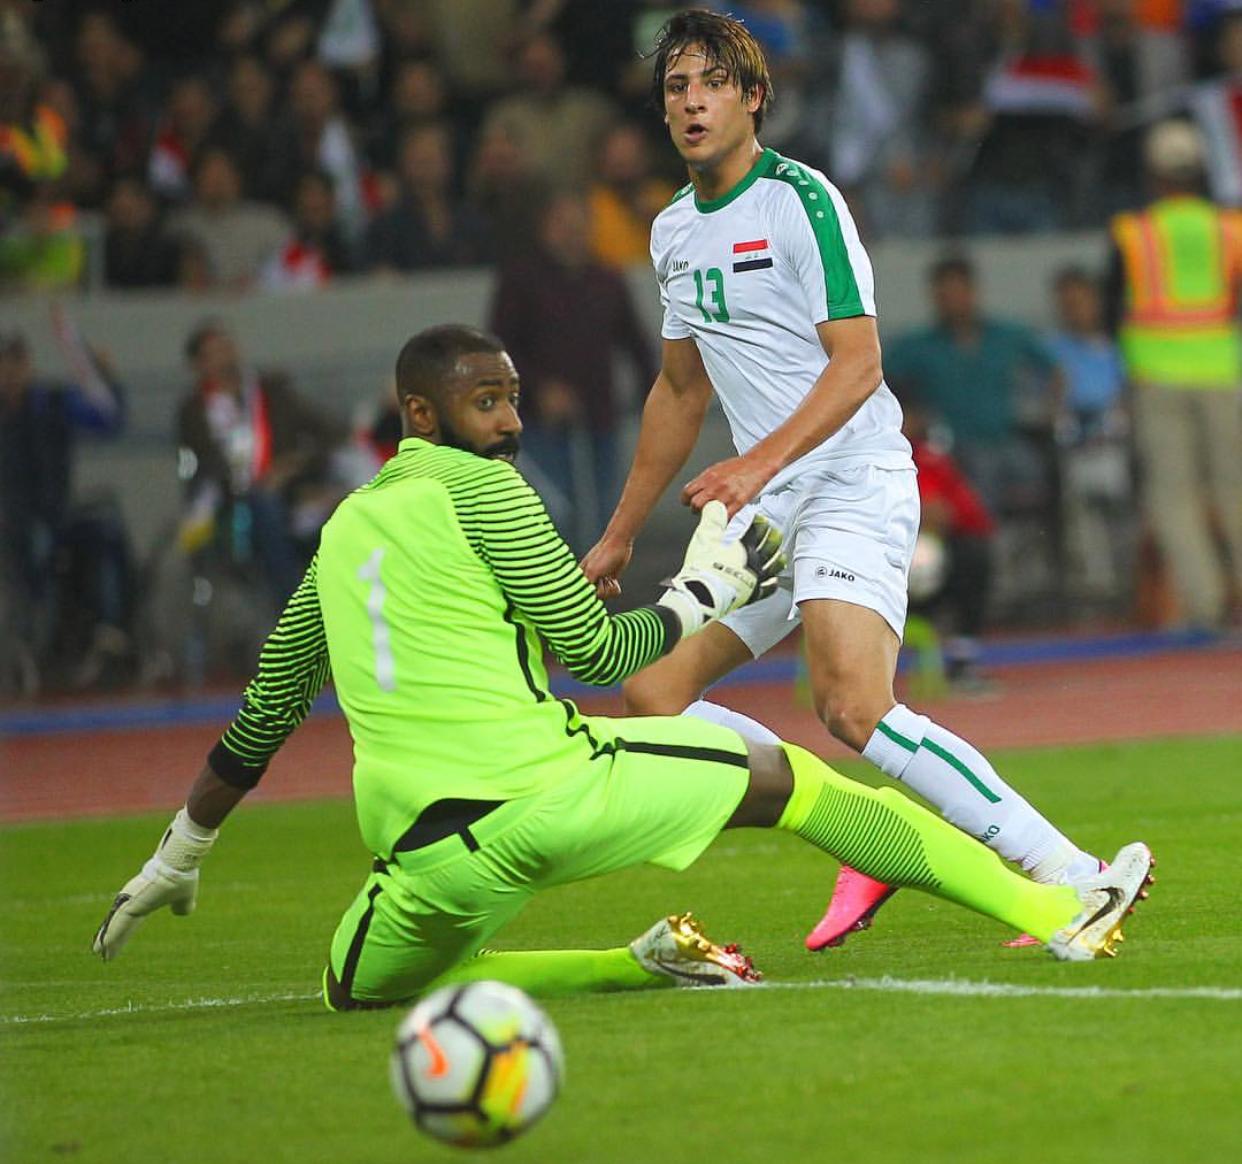 Photo of بالفيديو.. لاعب عراقي يجرز هدفا على طريقة مارادونا